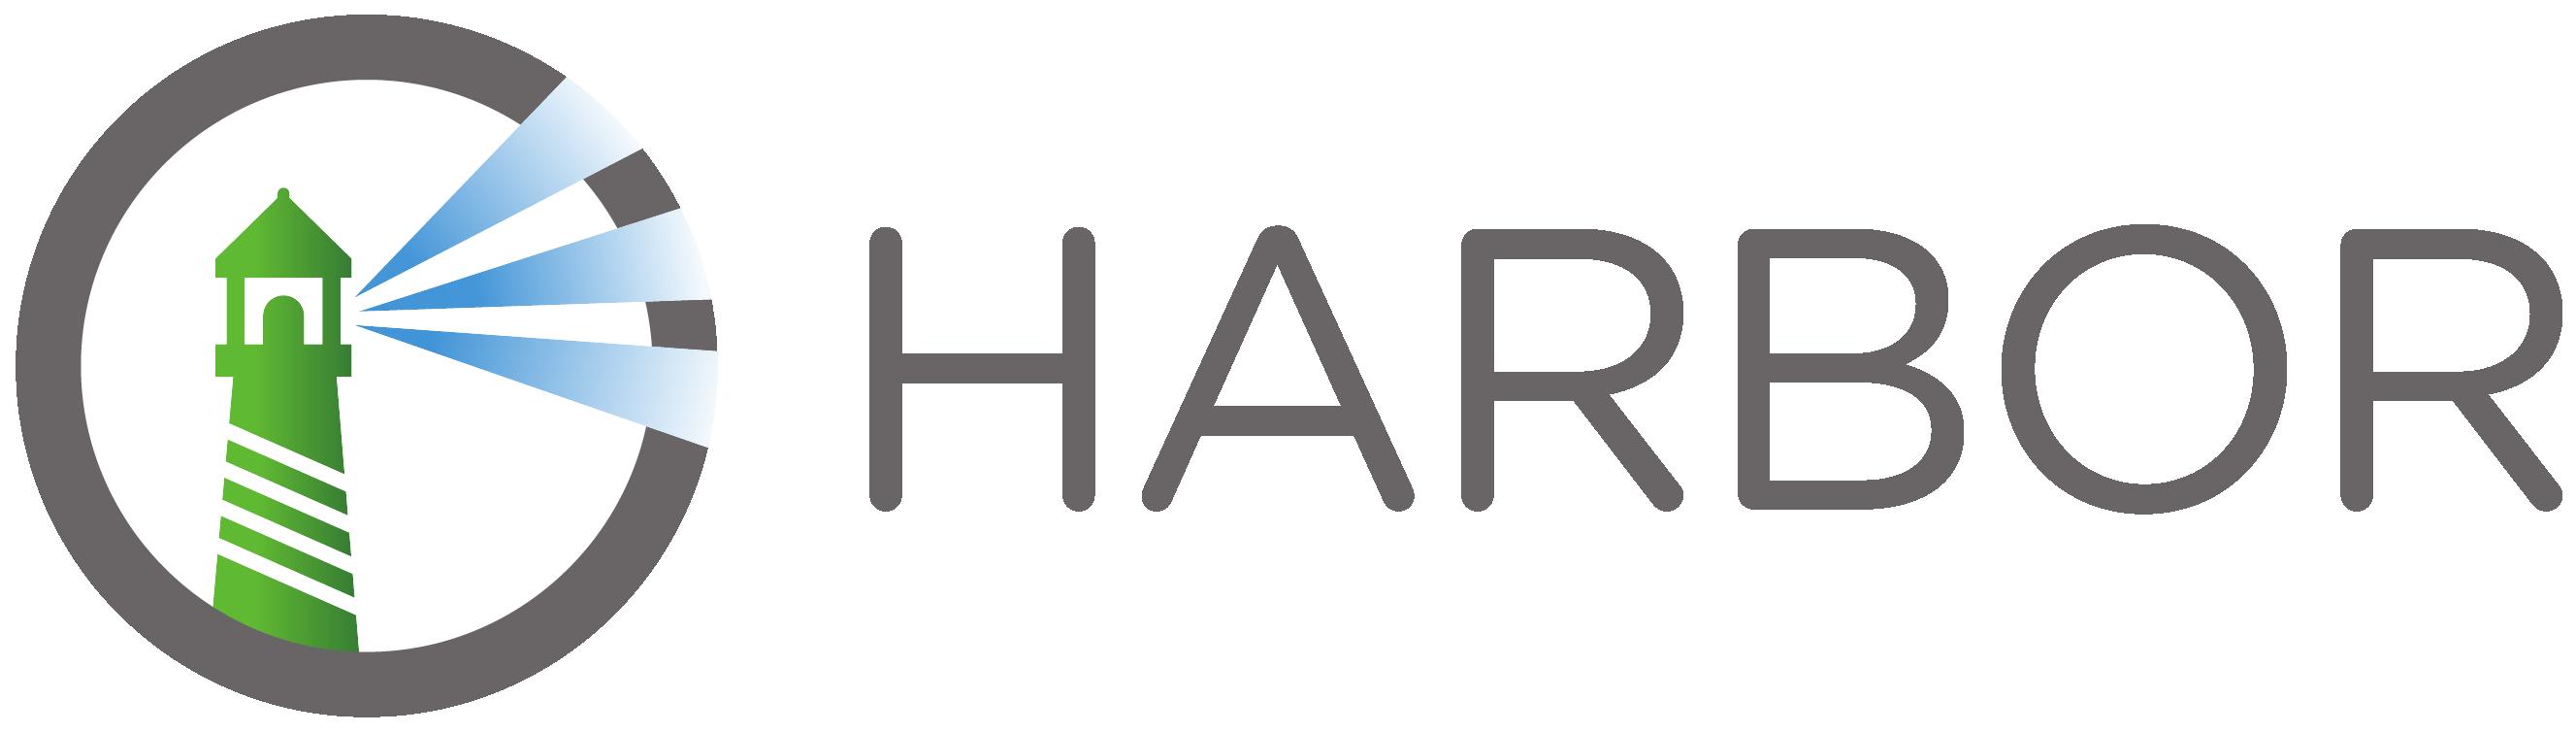 解决 Harbor 启动失败故障